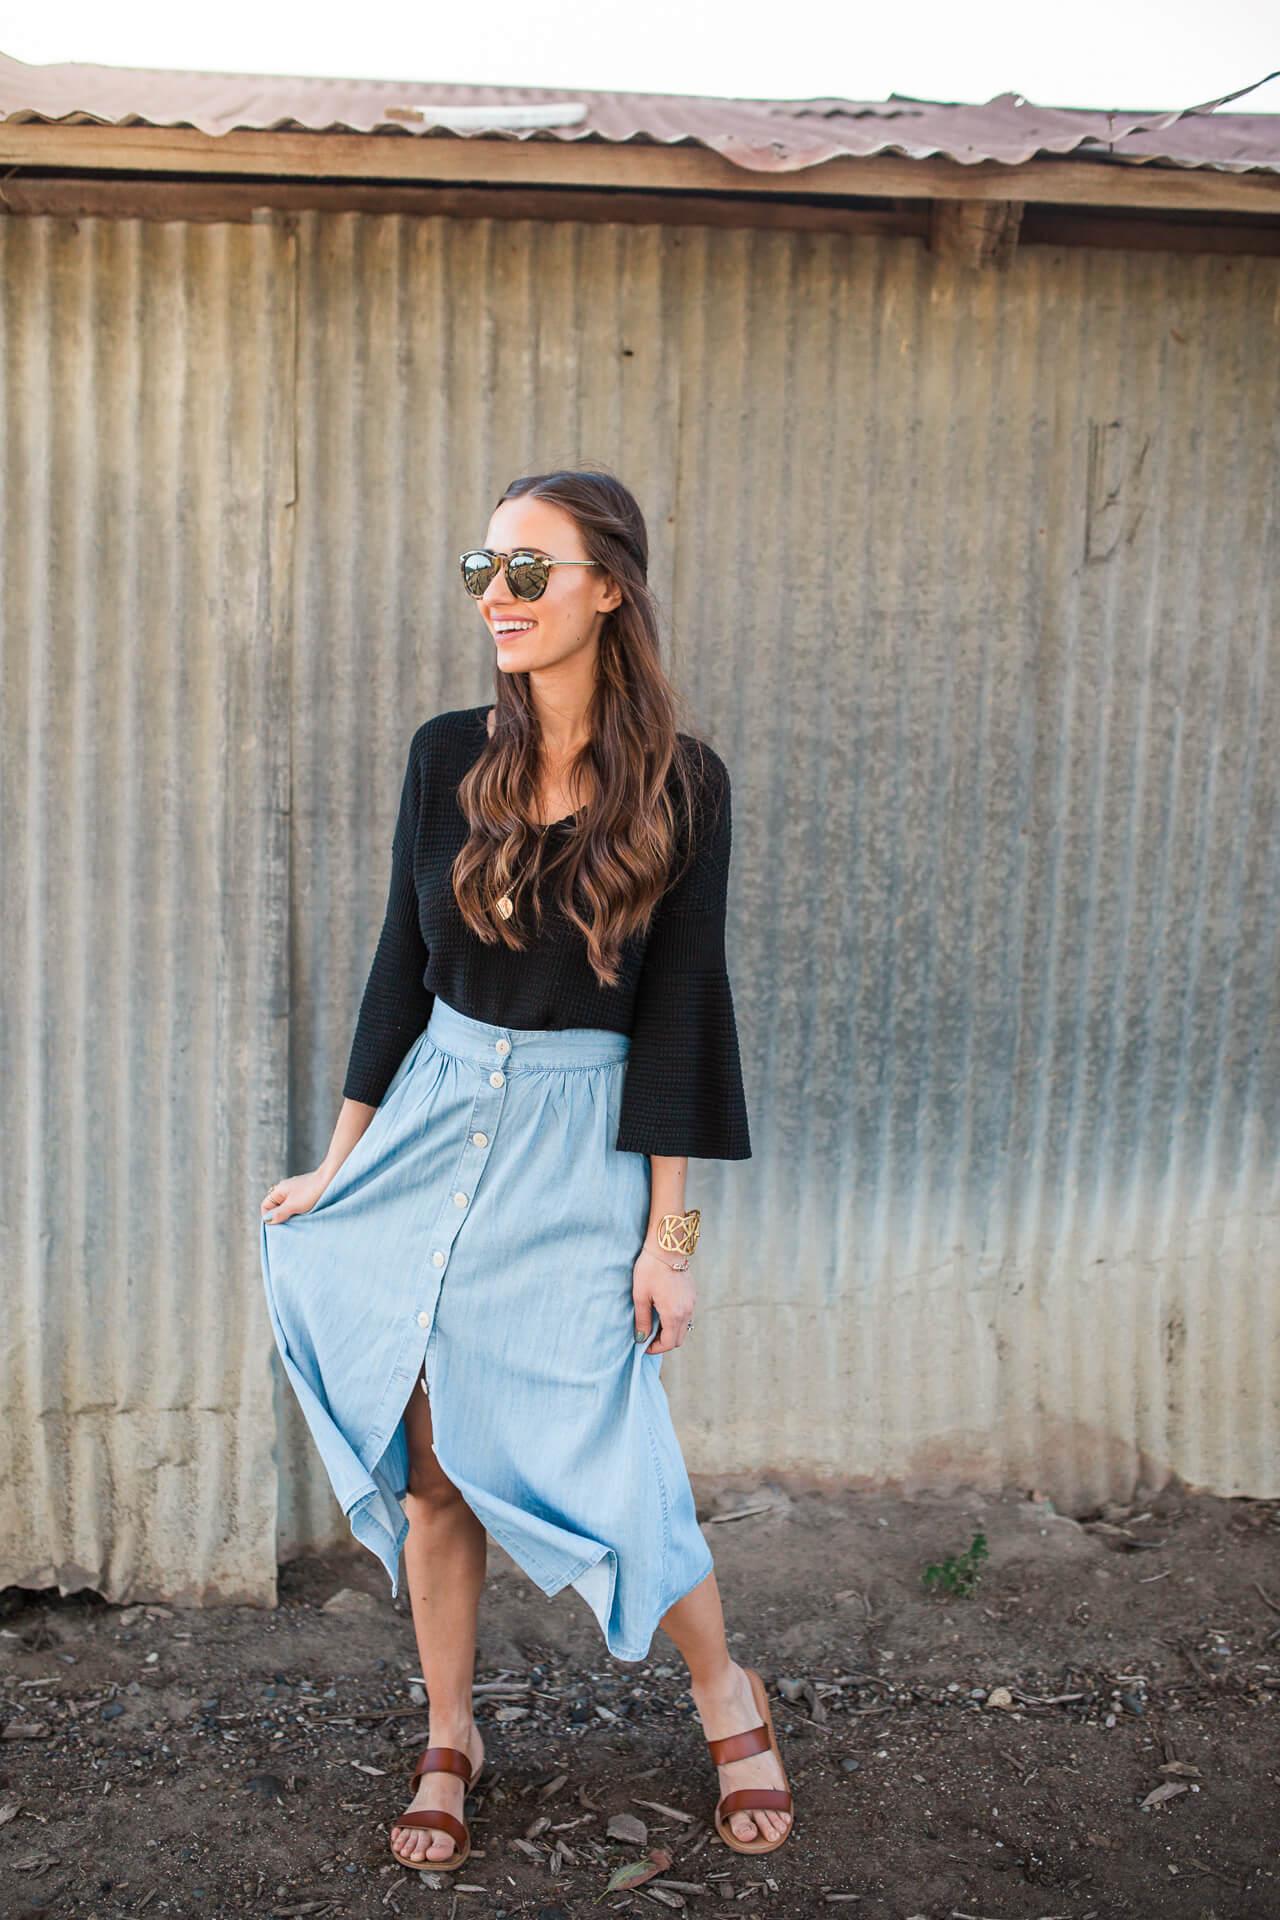 feminine fashion blogger outfit inspiration - M Loves M @marmar